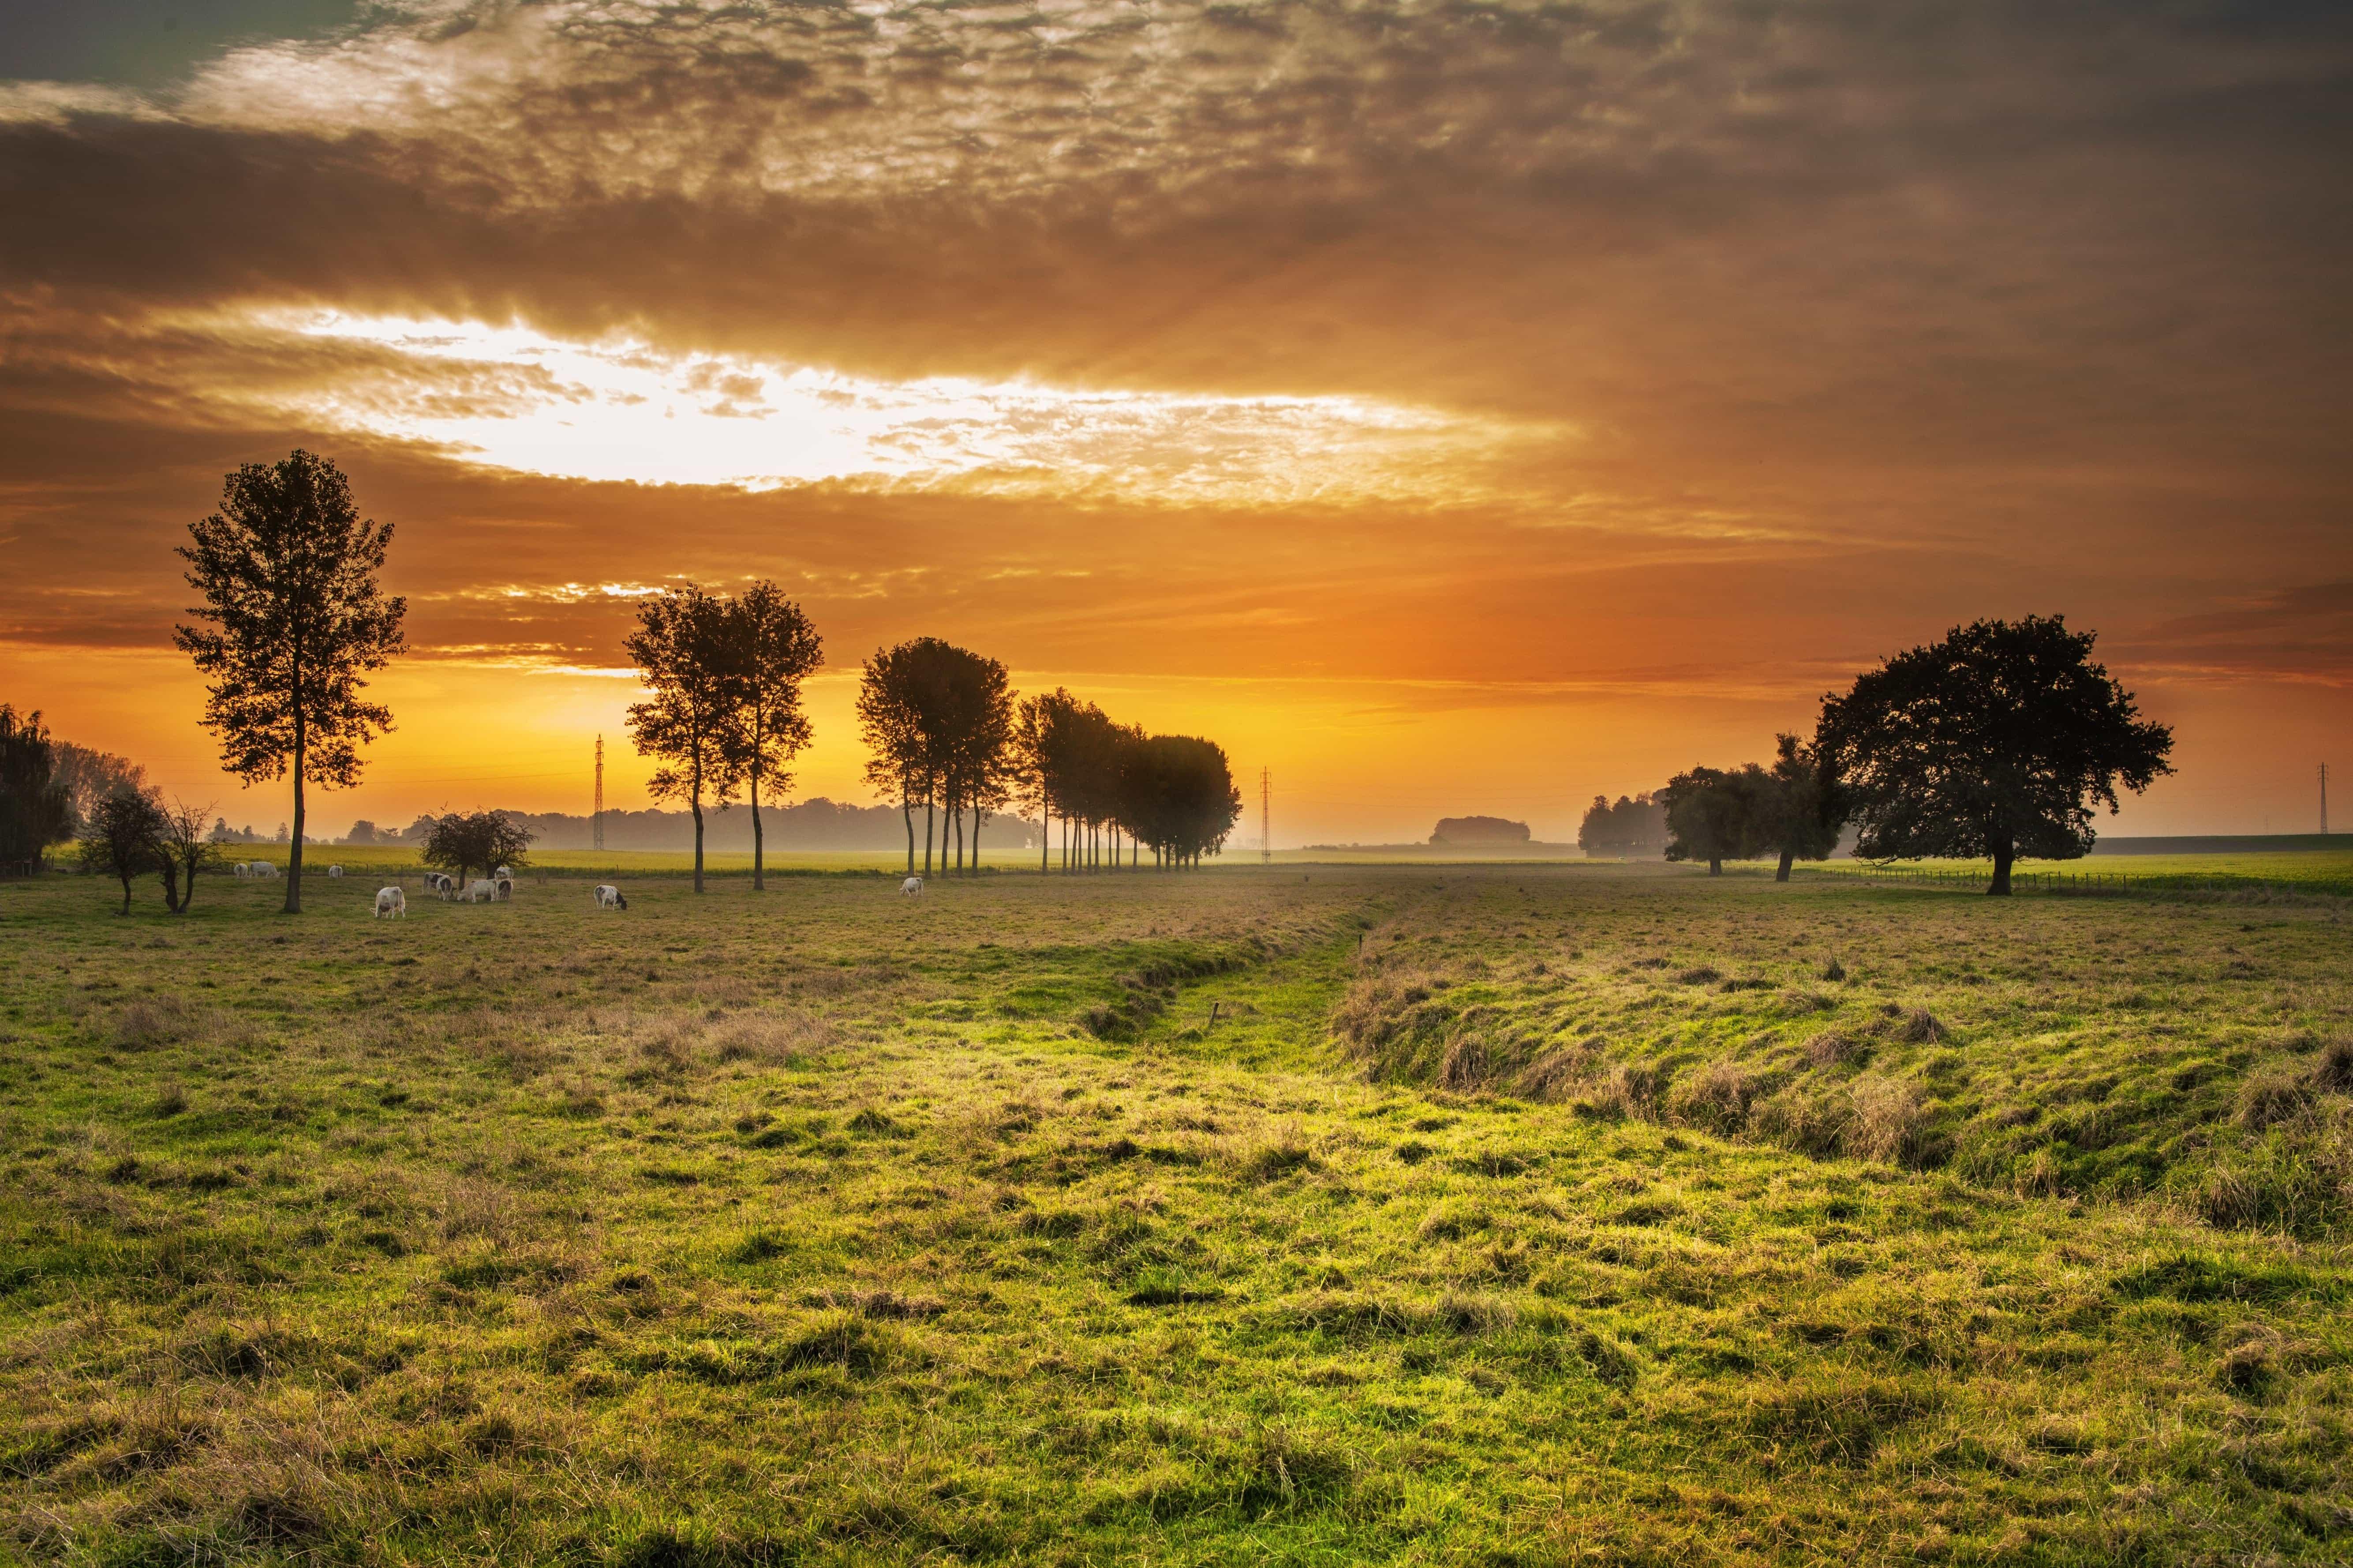 Awesome Pasture, Sunrise, Farm, Landscape, Tree, Dawn, Nature, Sun, Grass, Barn